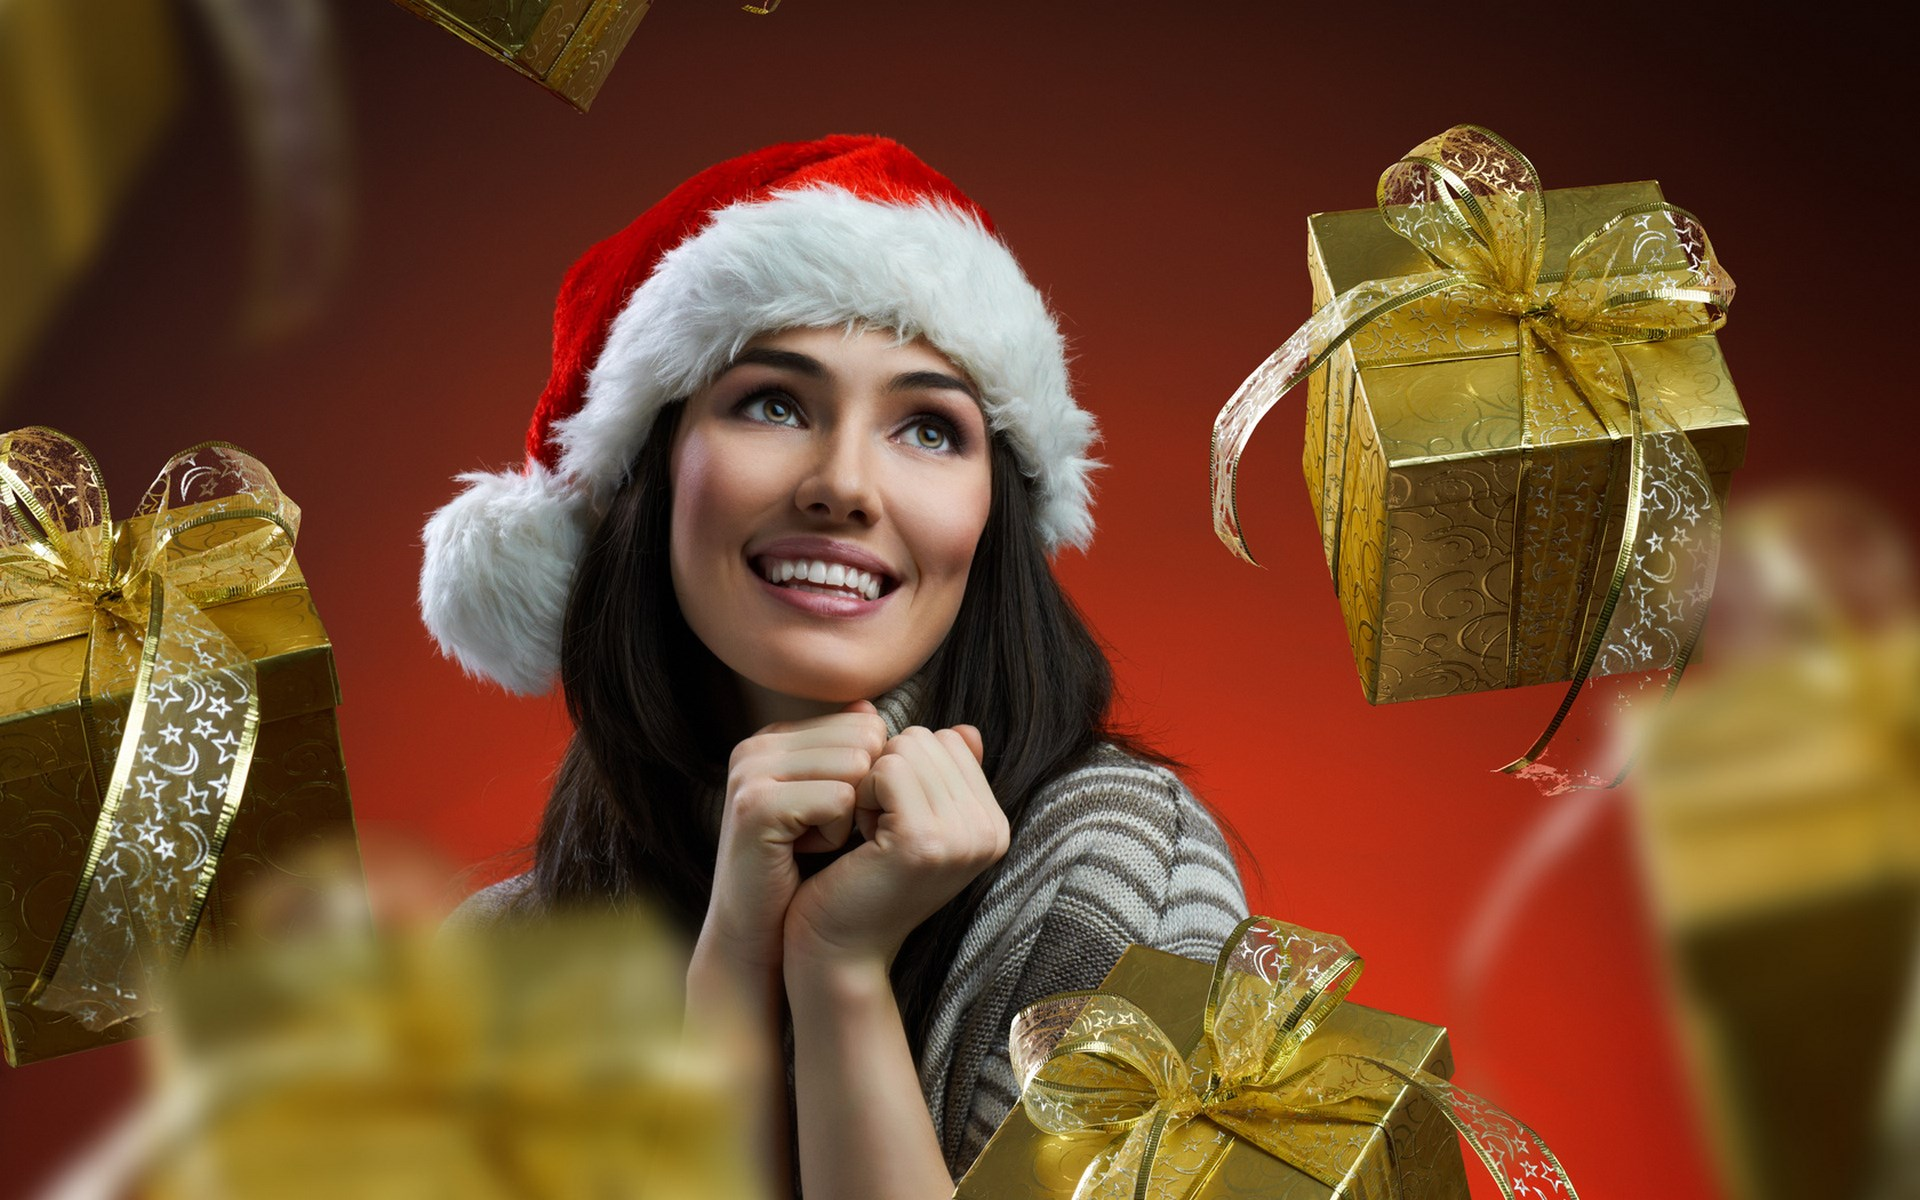 Ukrainian Christmas traditions